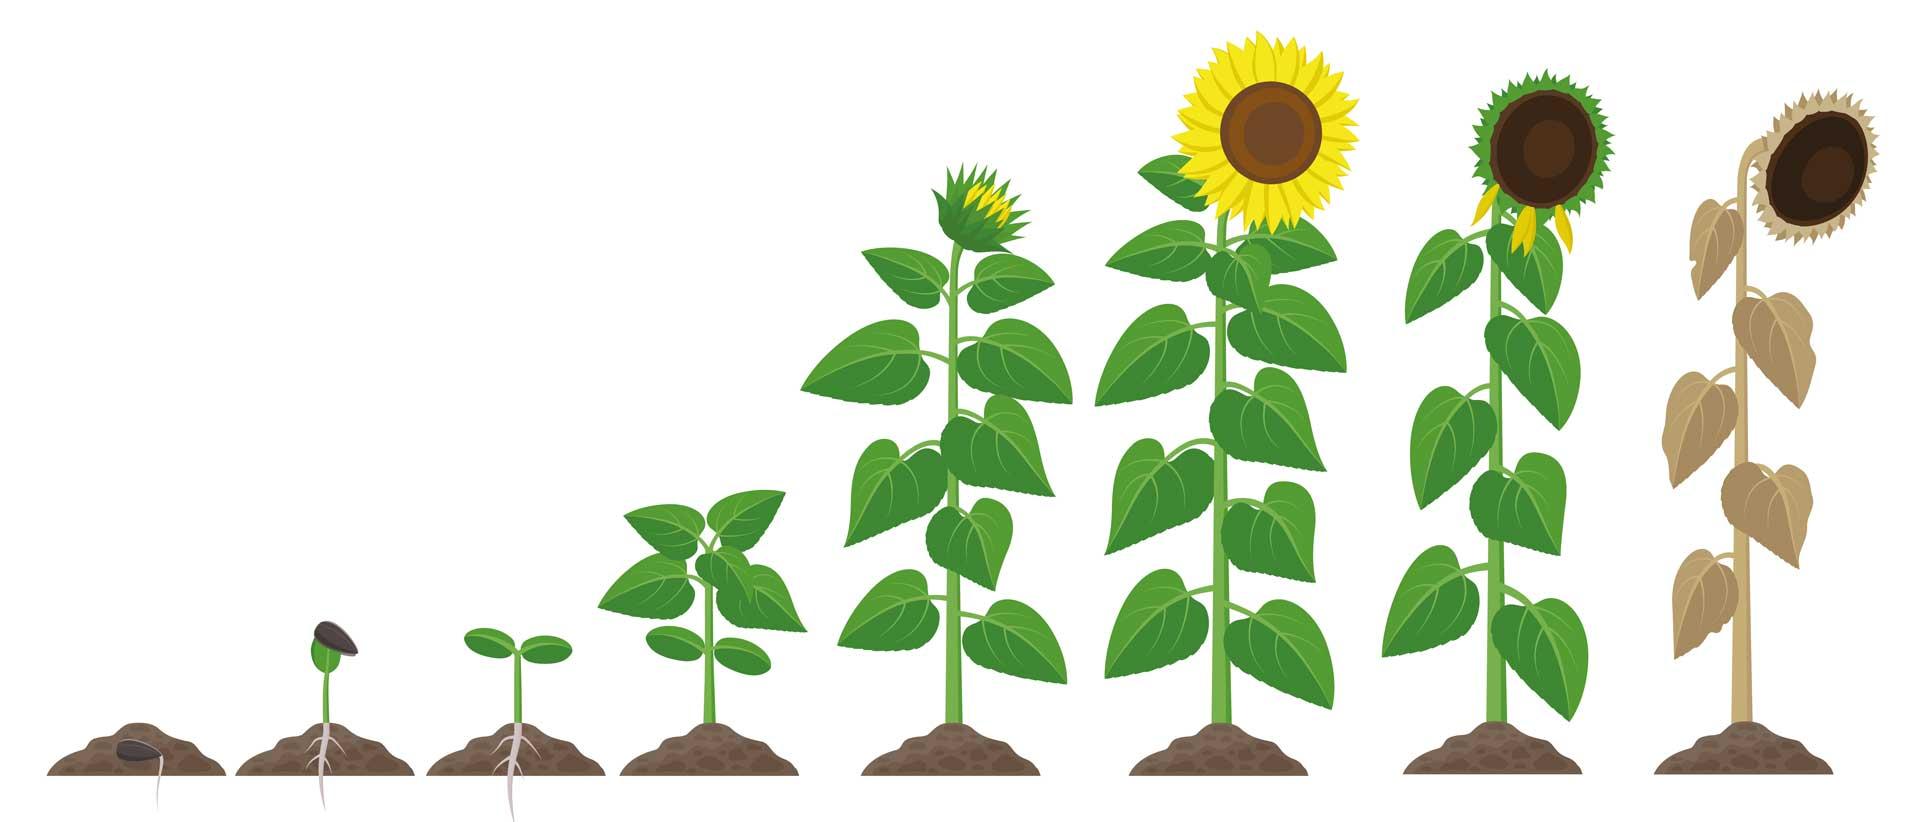 Sunflower growth